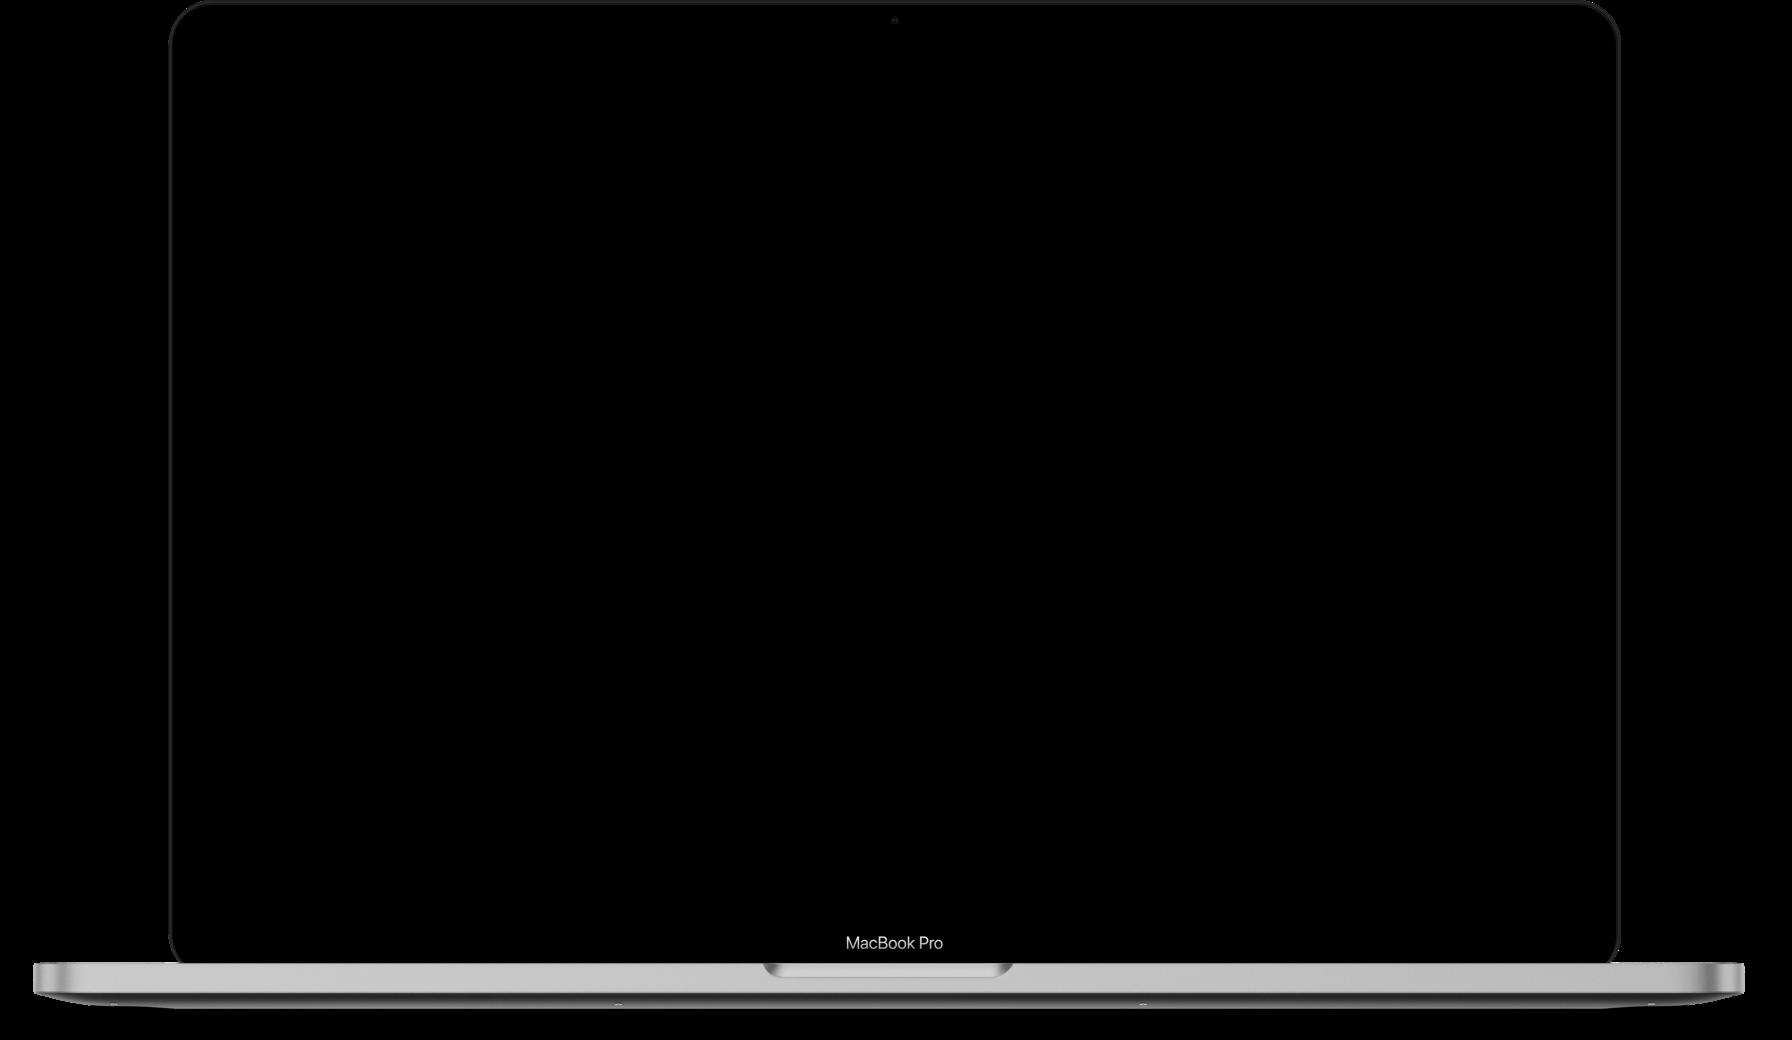 Macbook Pro Laptop Opened Up